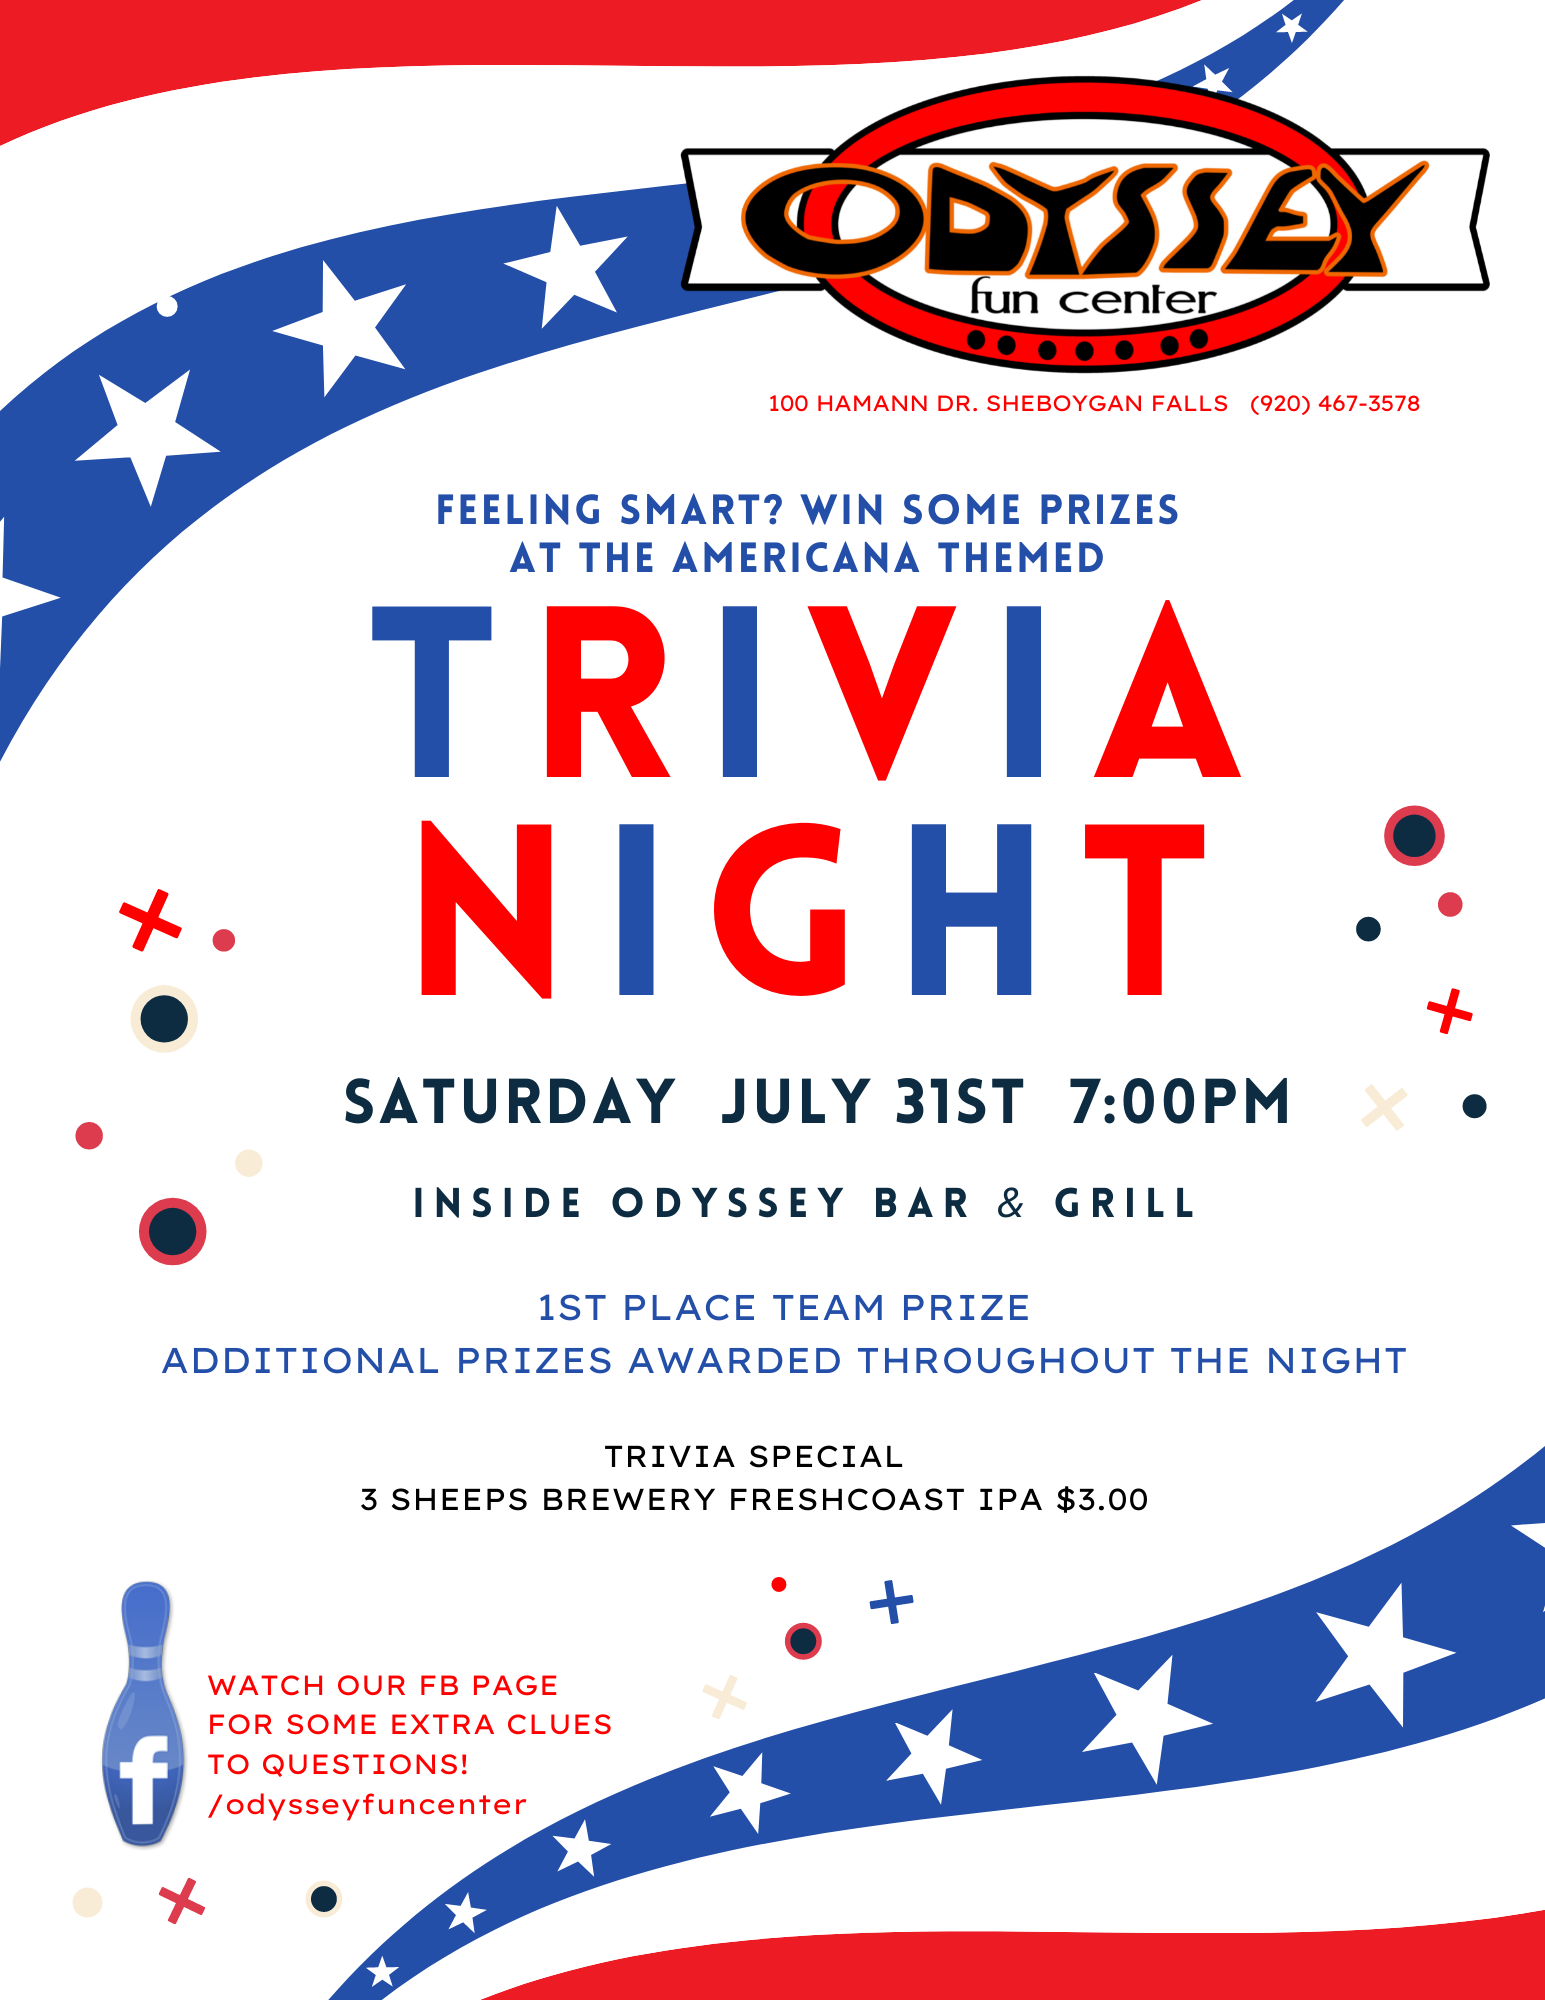 Trivia Night   Odyssey Fun Center   Sheboygan WI